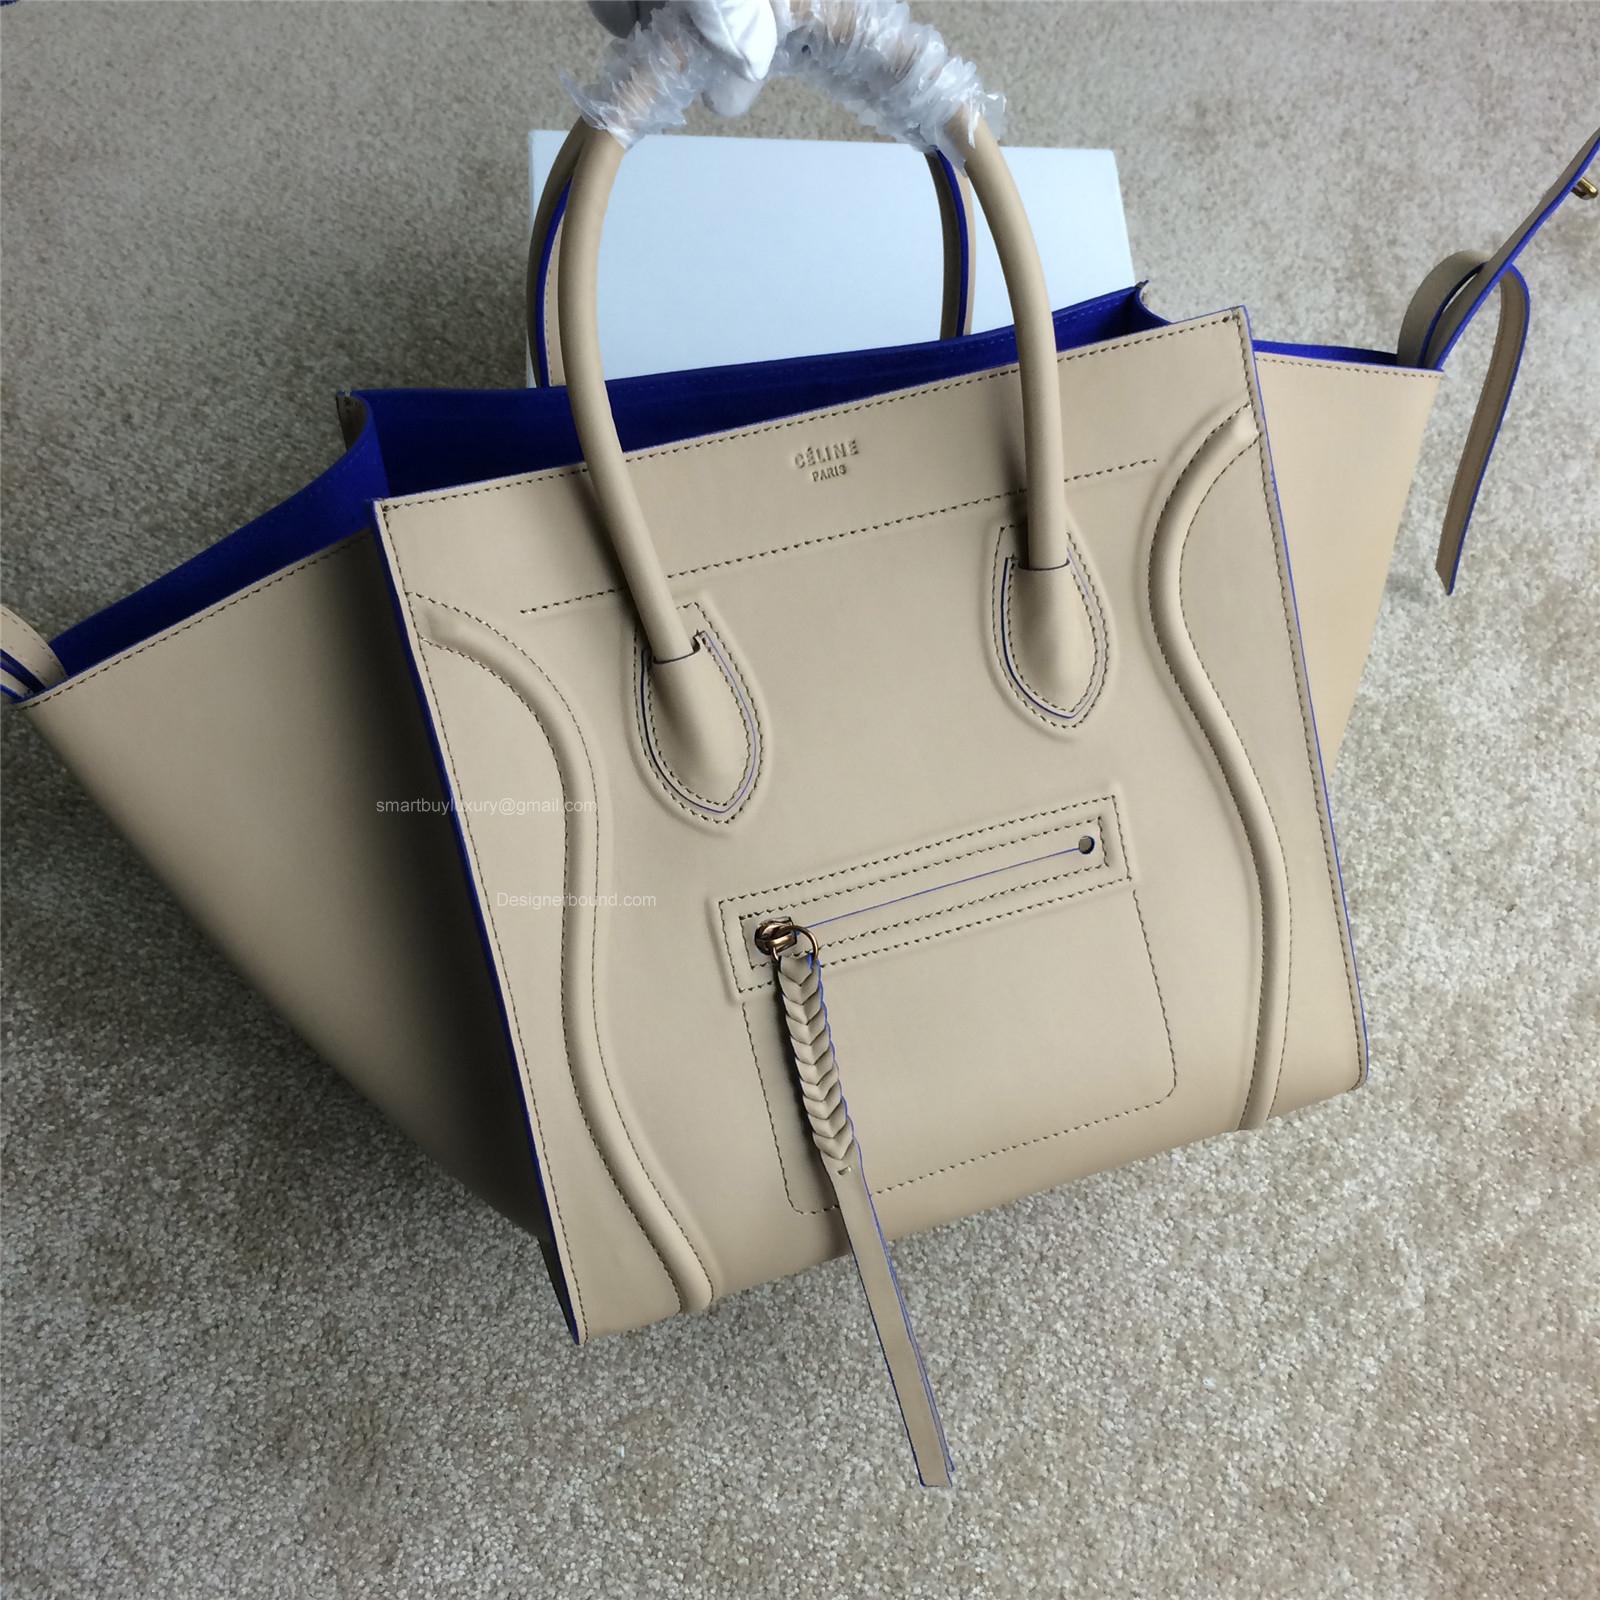 Celine Phantom Luggage Handbag in Calfskin Nude with Blue Trim -